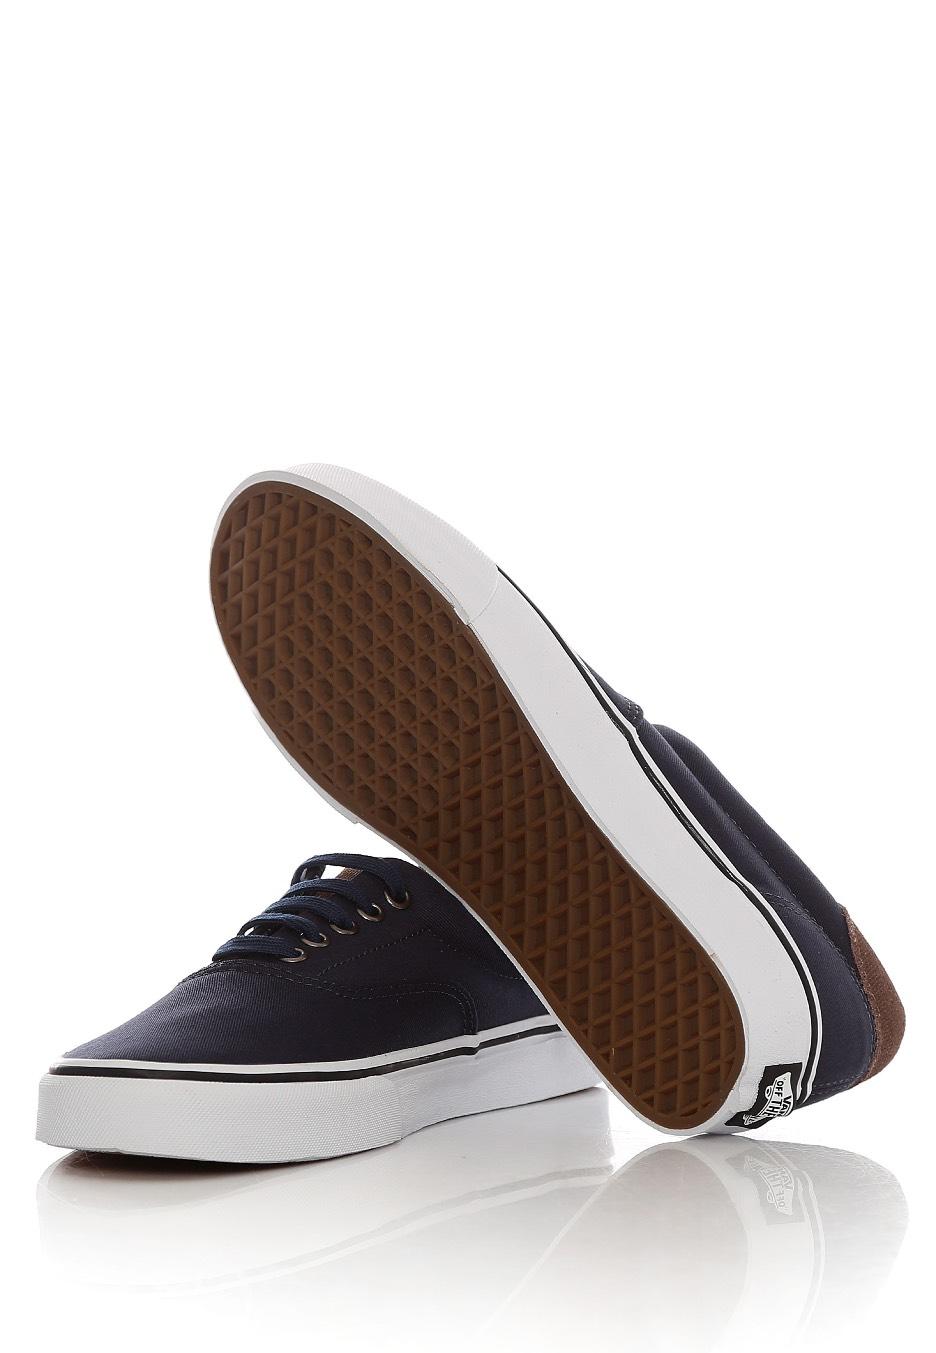 159c9aaa61017d ... Vans - Era 59 Cord   Plaid Dress Blues True White - Shoes ...